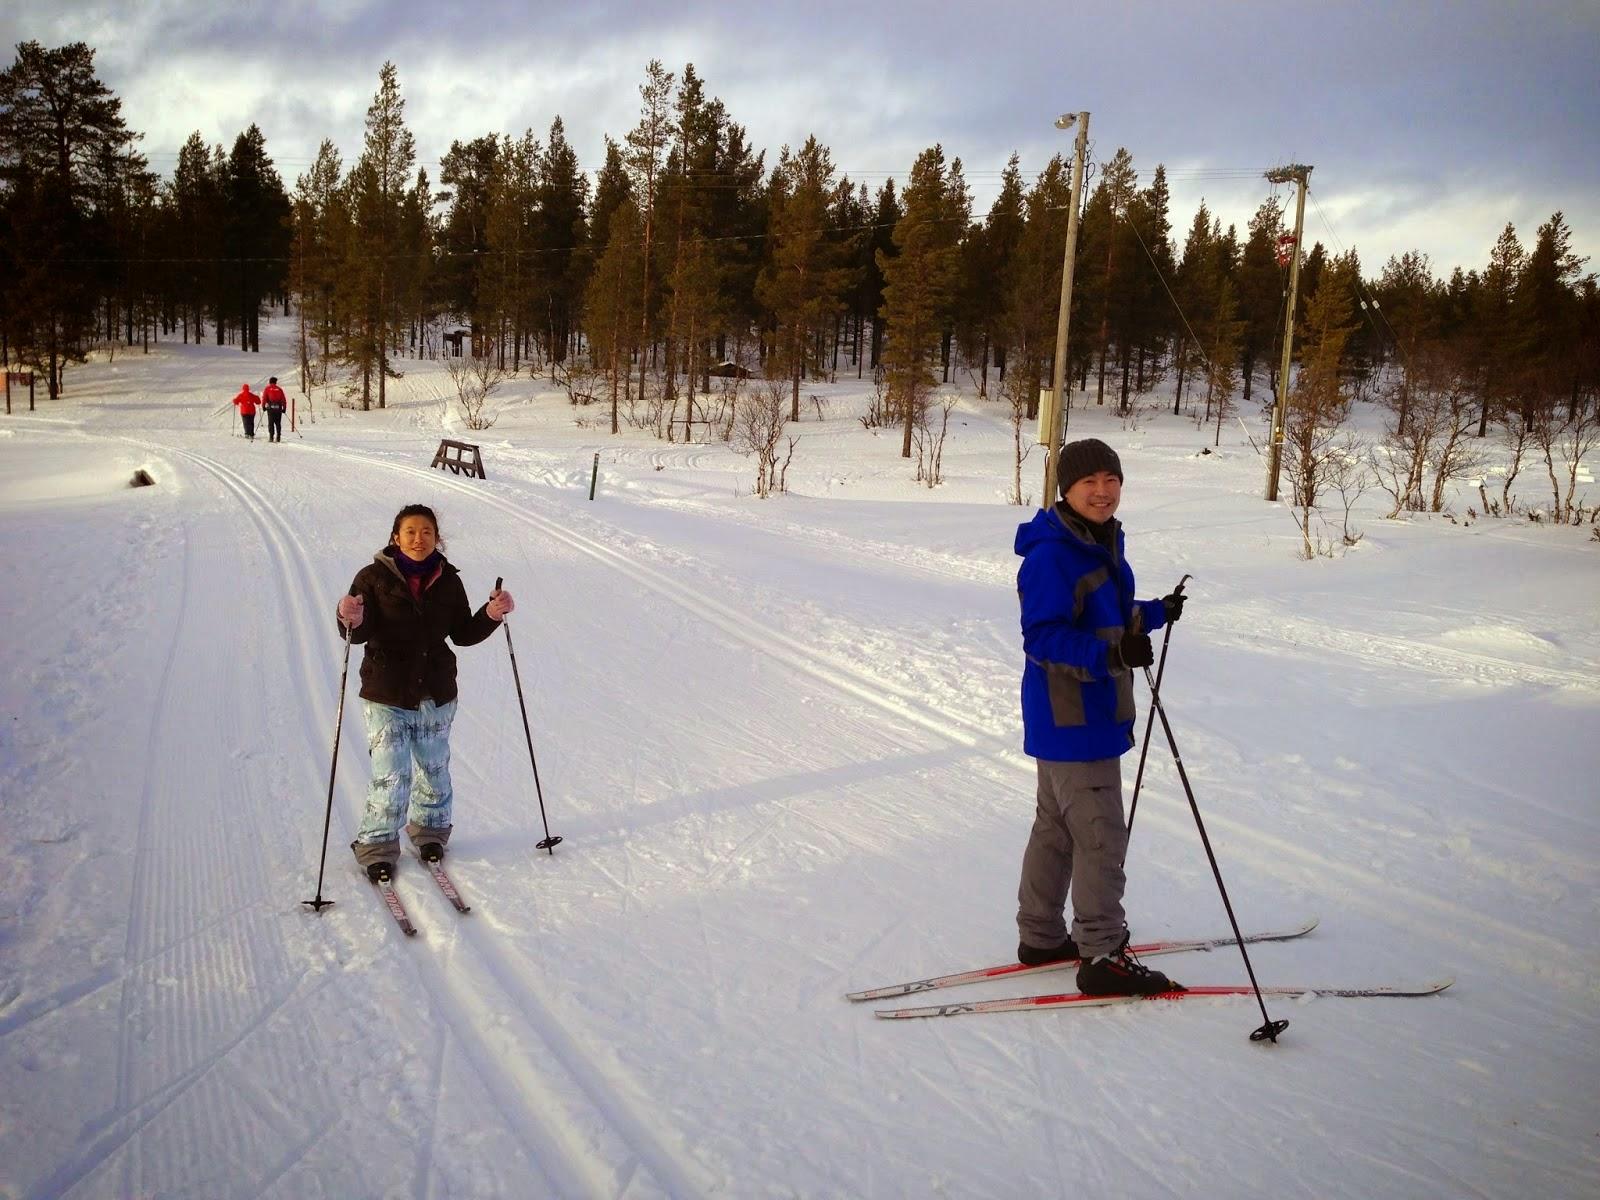 Skiing Kilopaa Fell Finland